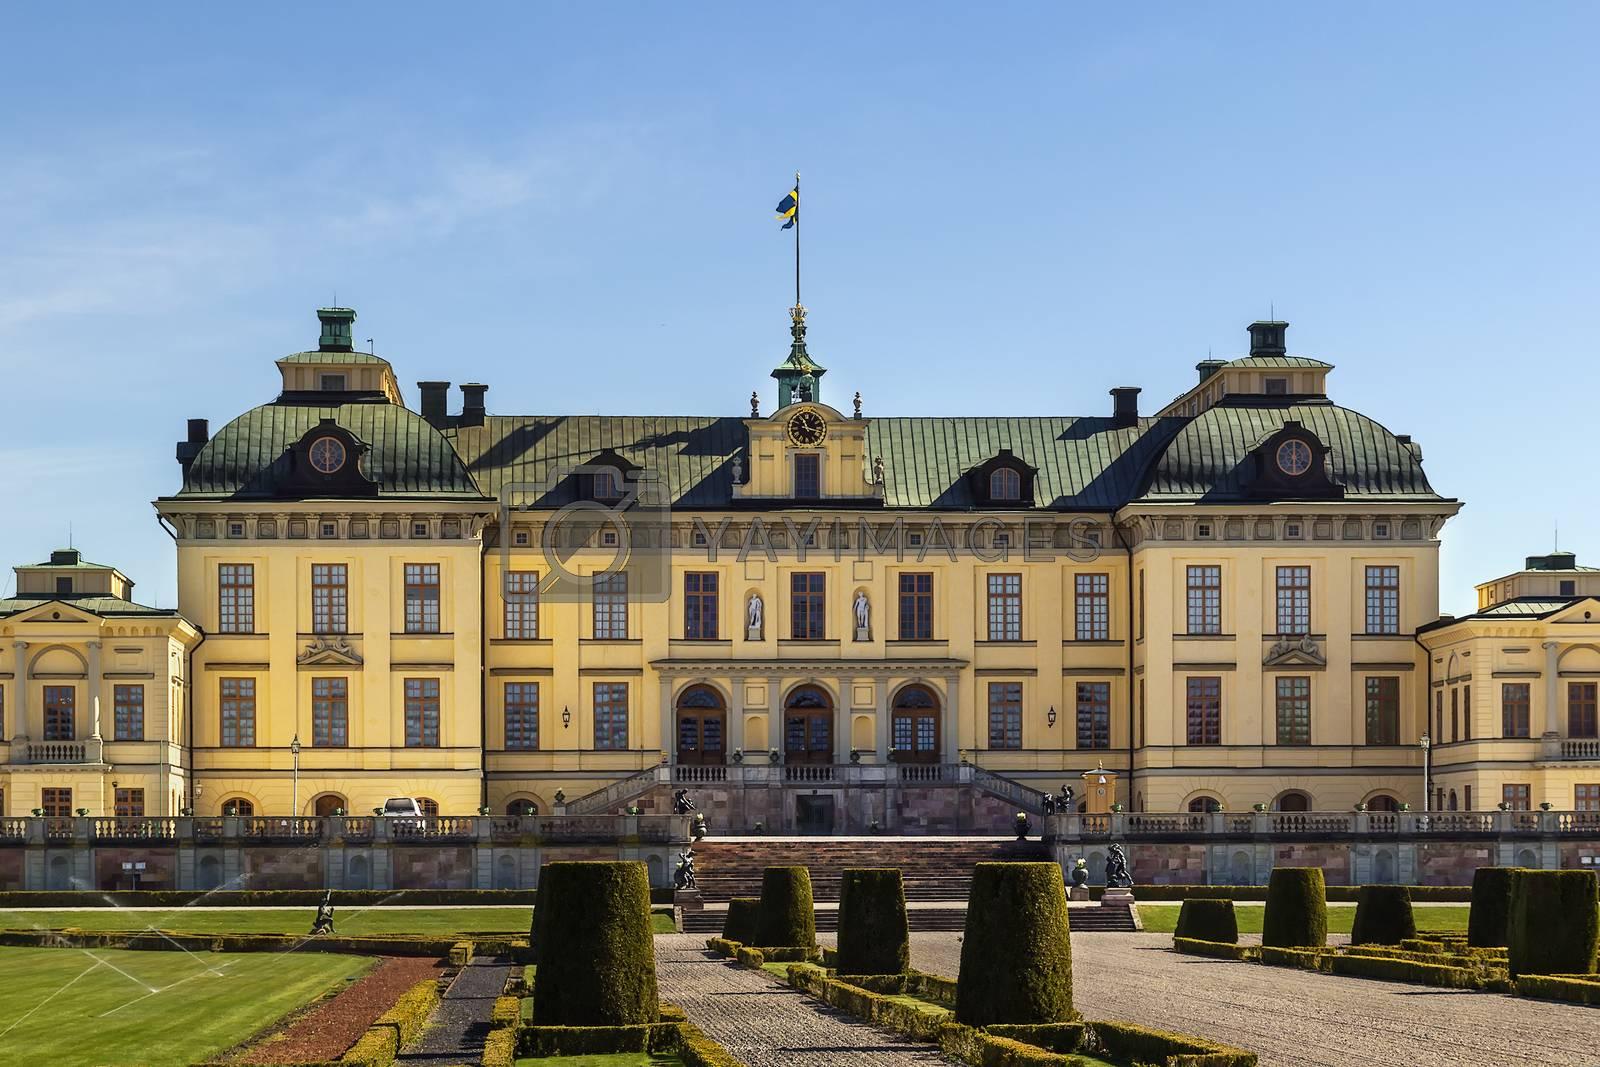 Drottningholm Palace, Stockholm by borisb17